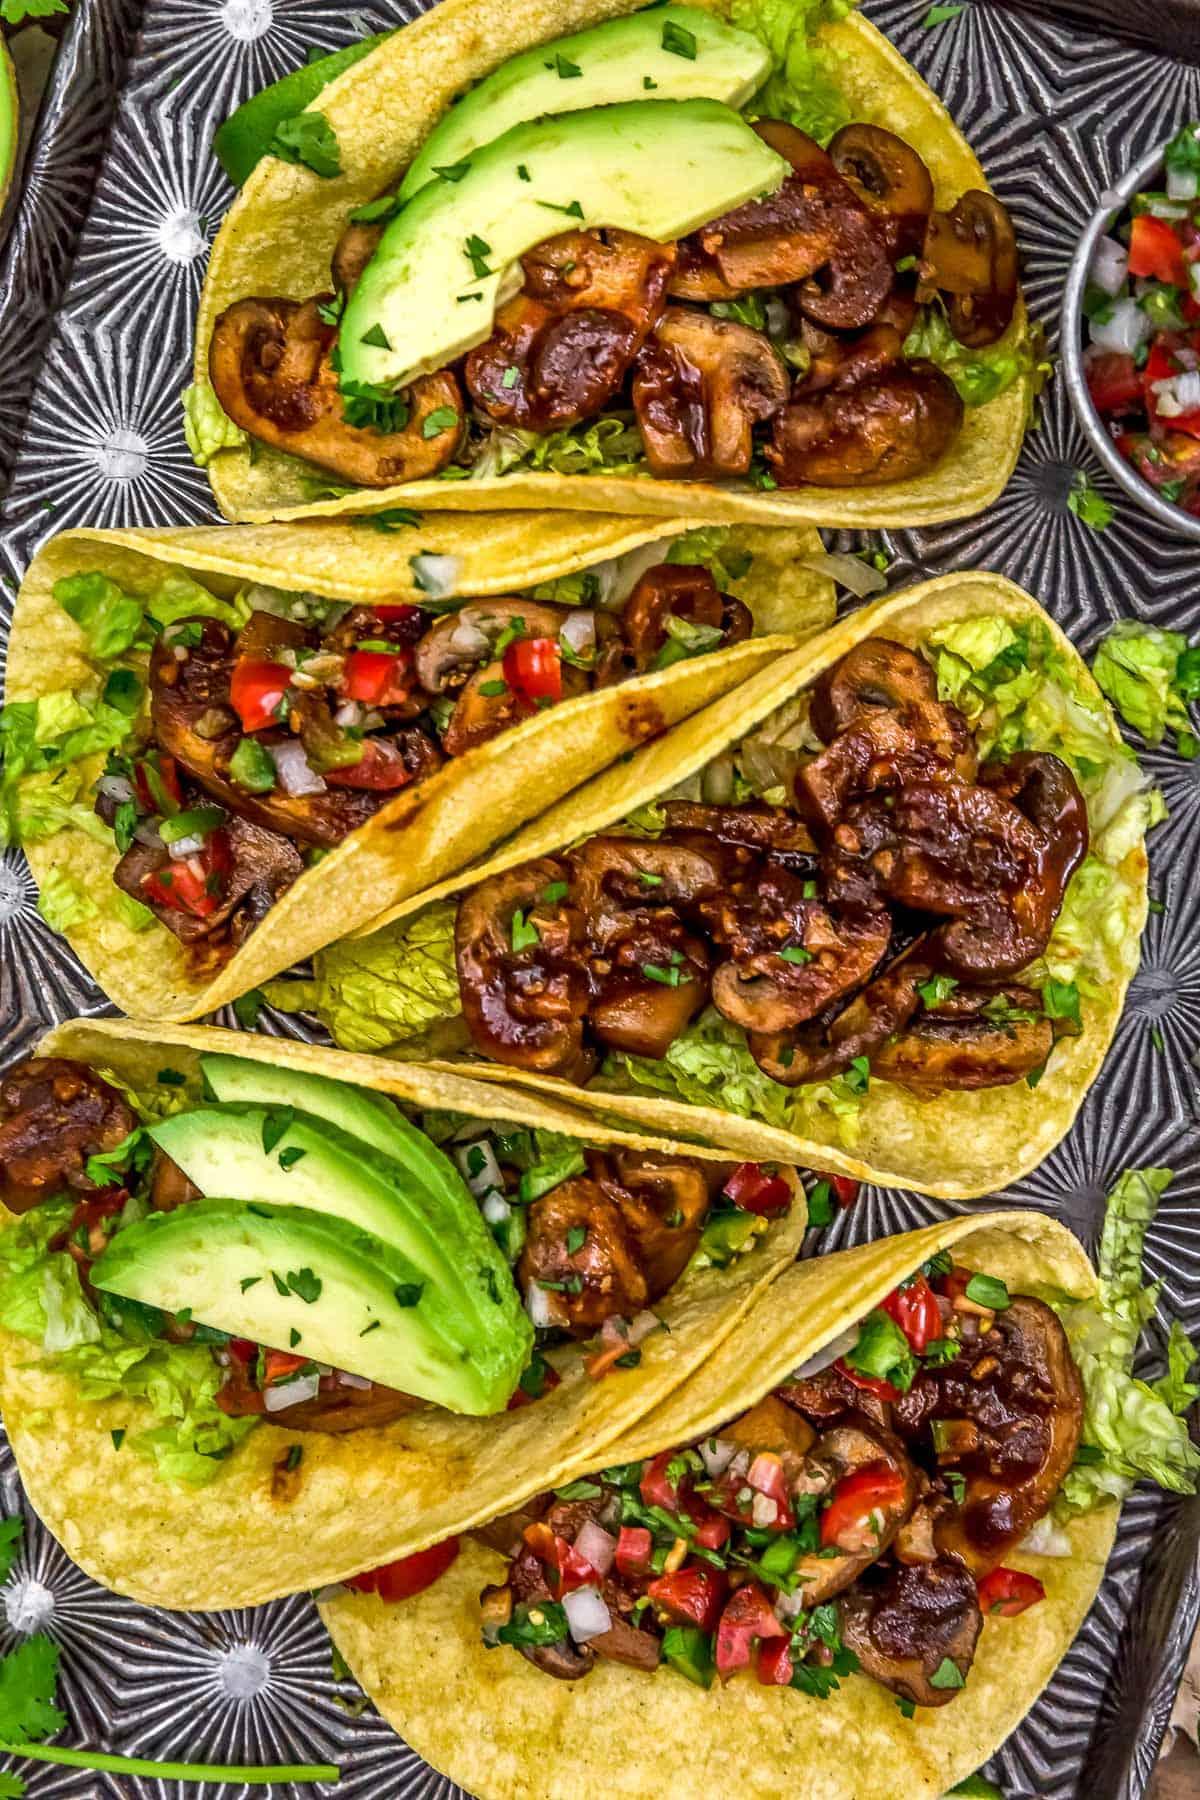 Tray of Chipotle Mushroom Tacos